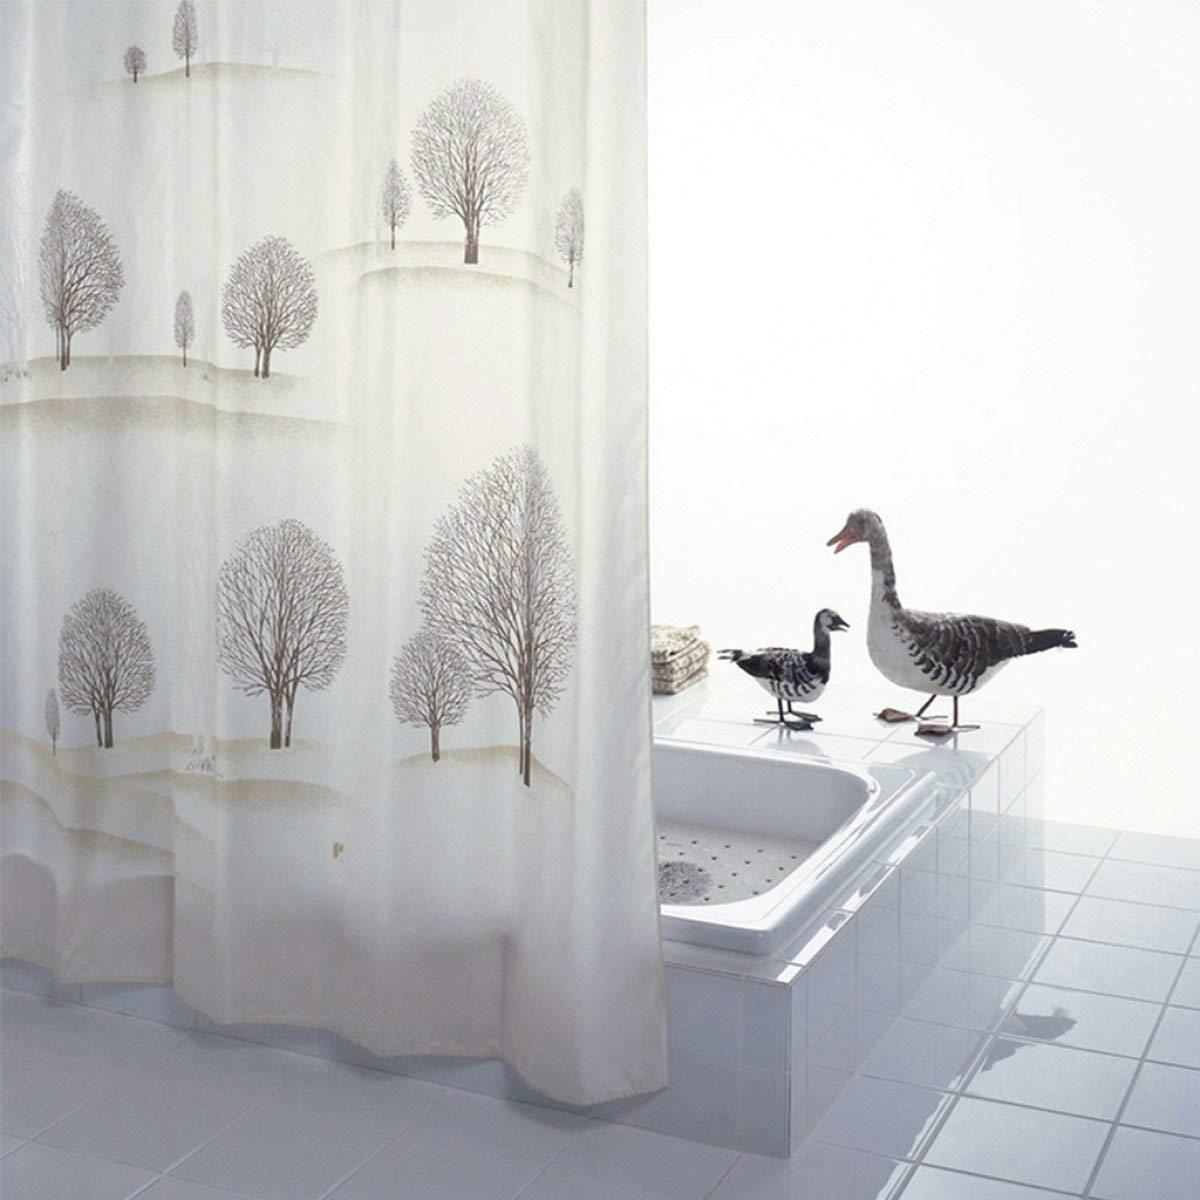 CURTAIN HOME しわ防止砂漠の木強化された防水カビポリエステル浴室のシャワーカーテンプラスチックフック付き増加浴室付属品 (Size : 180cm*200cm) B07NRYR64P  180cm*200cm